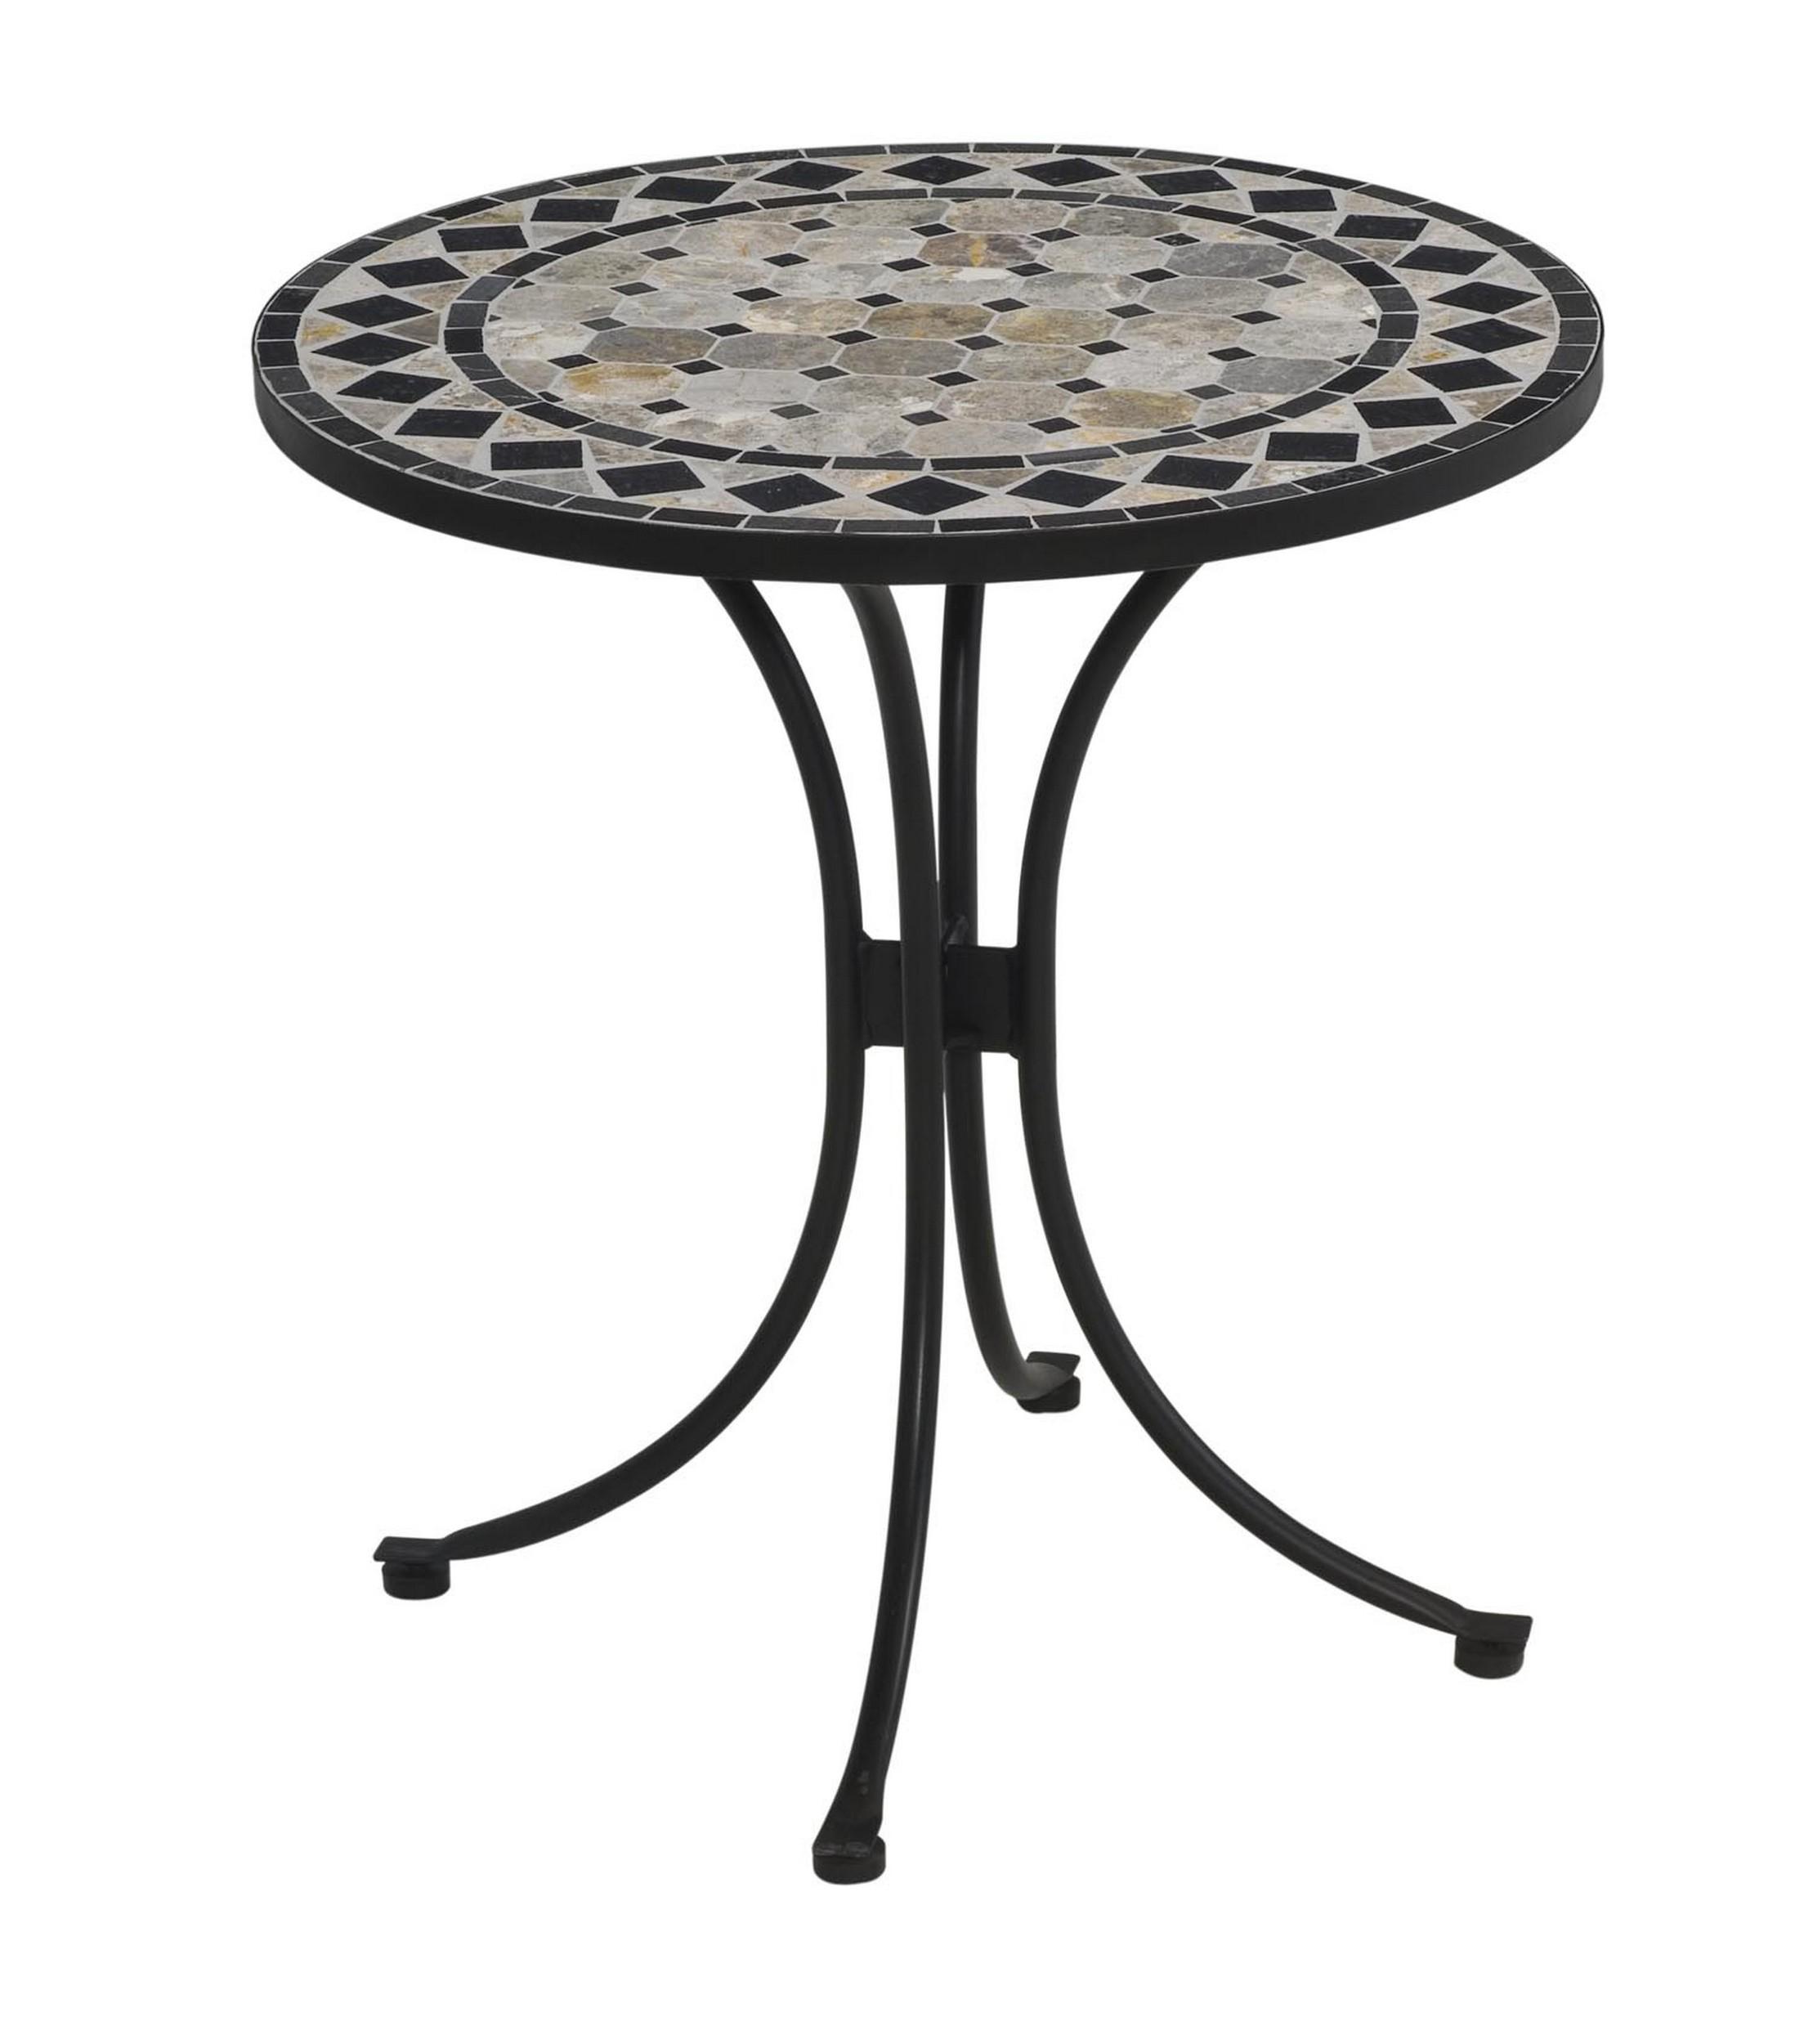 Tan and Black Tile Top Bistro Table